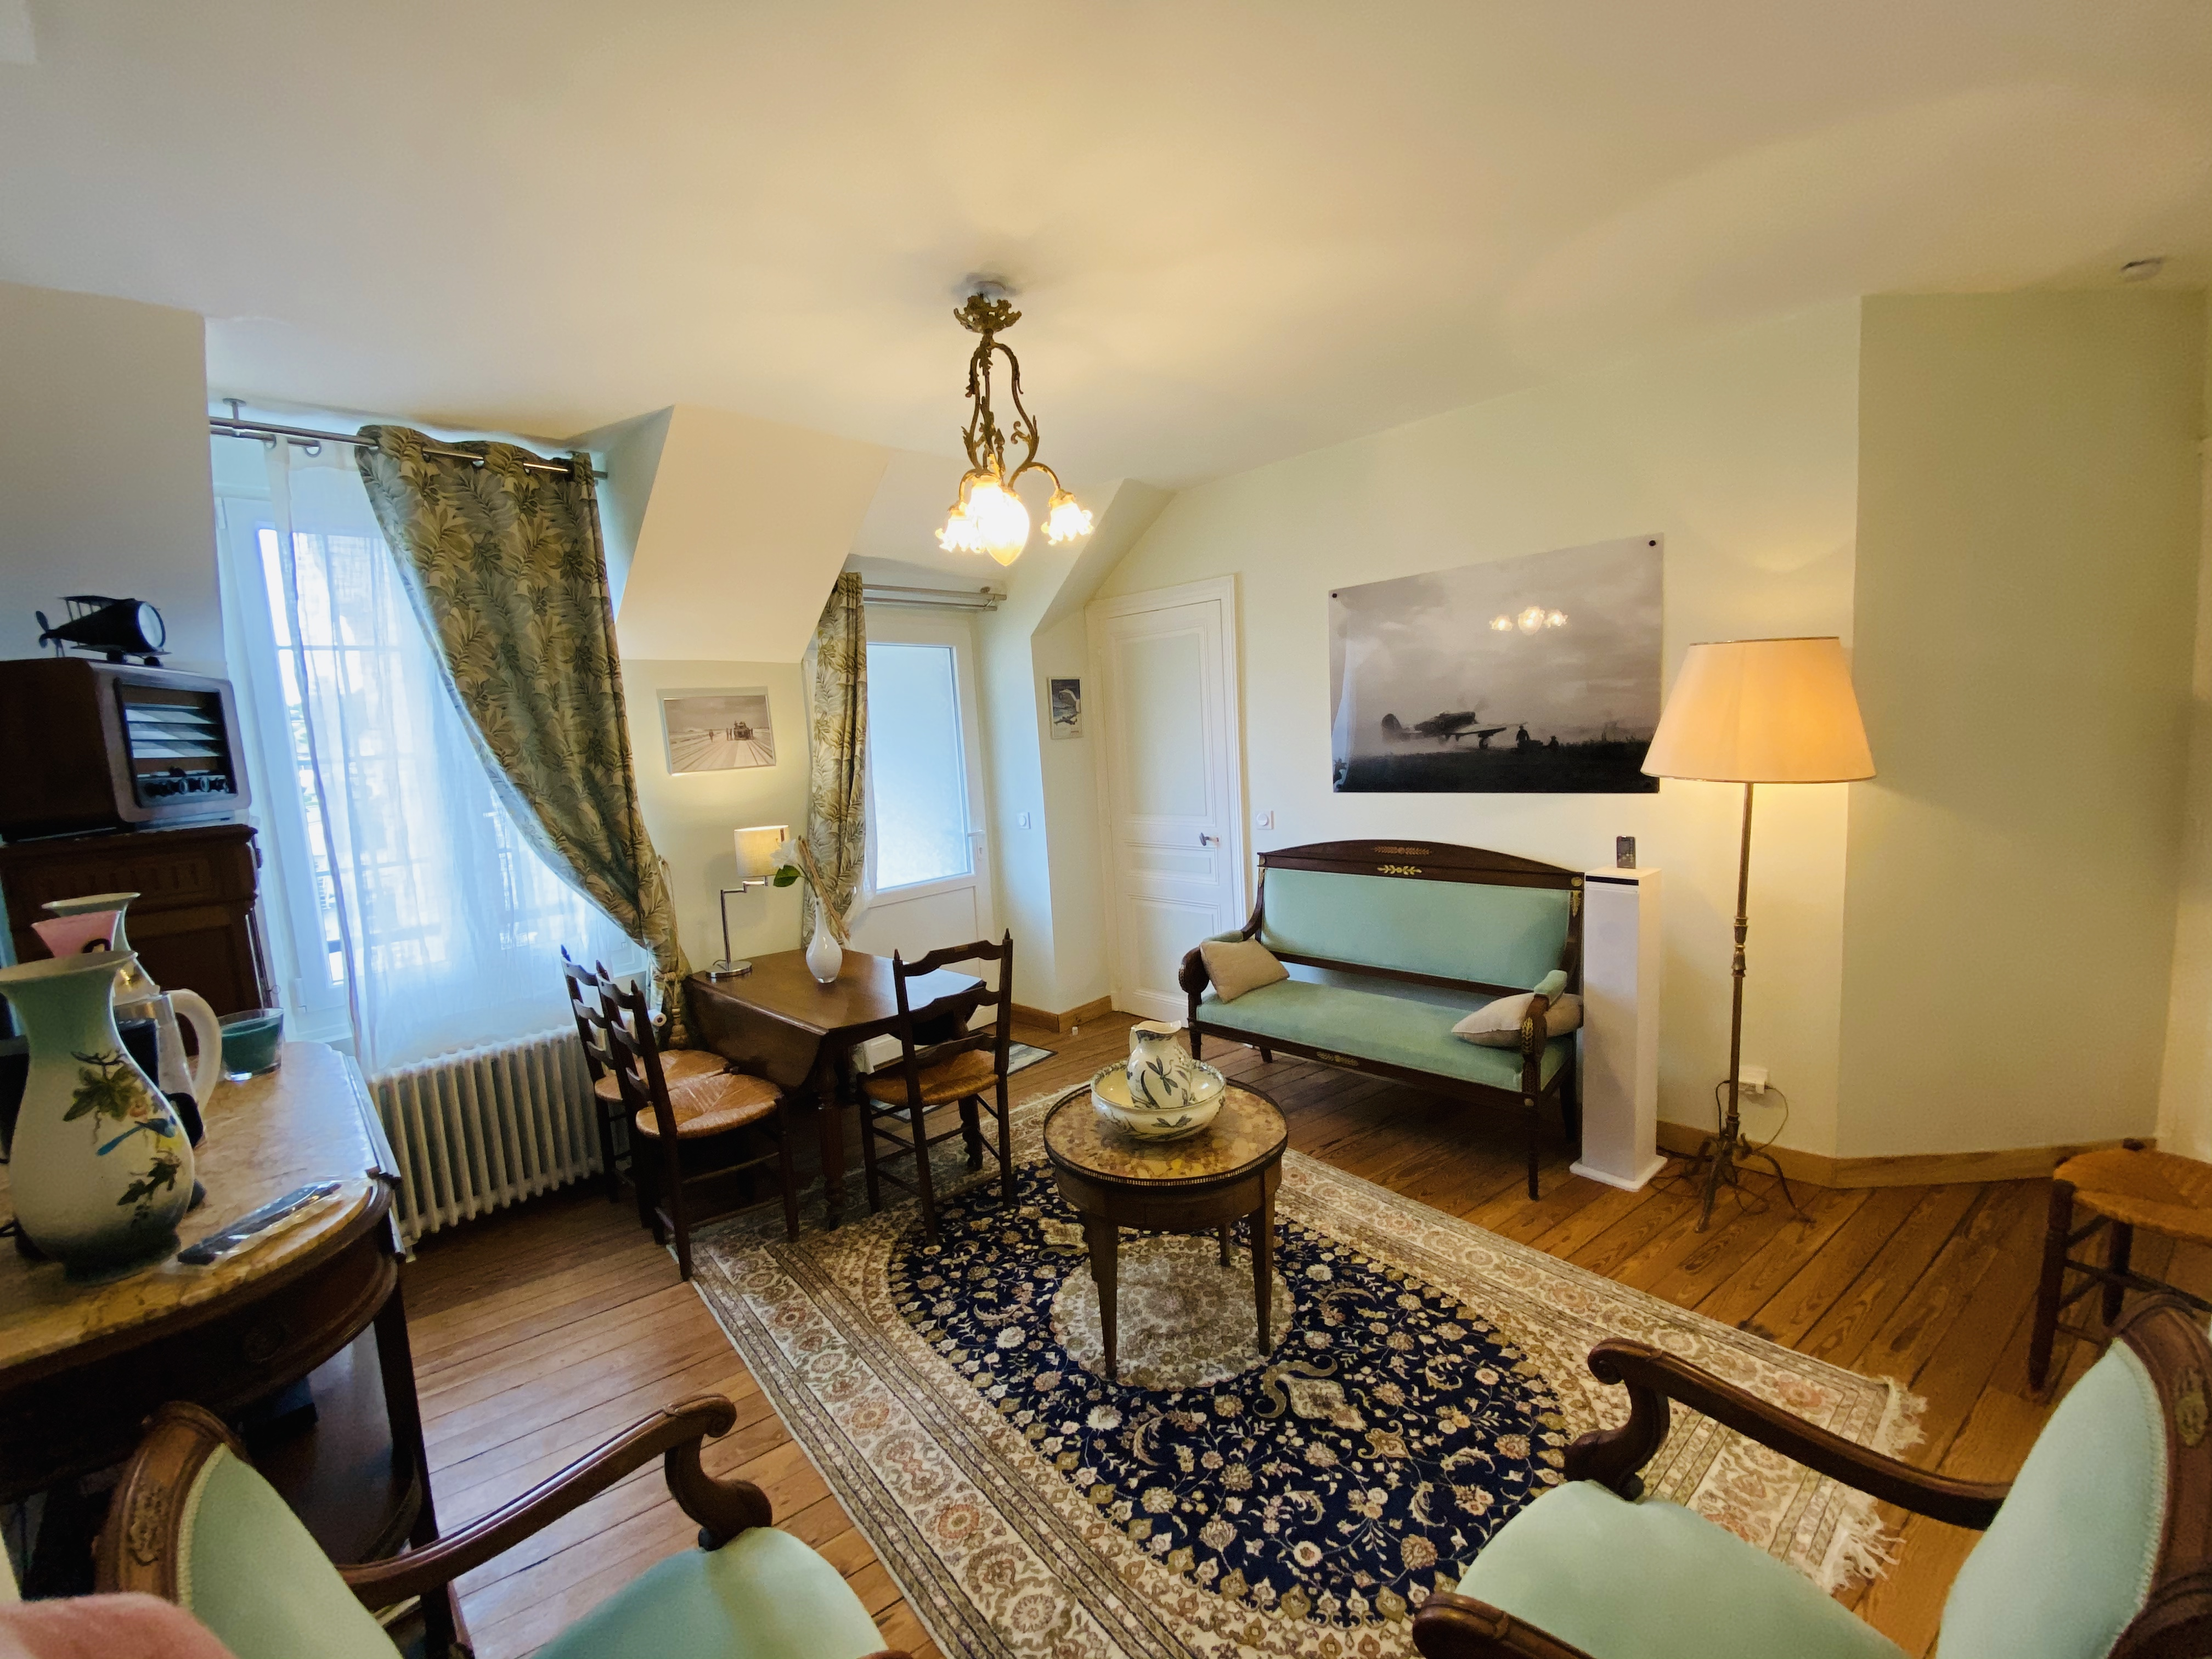 DDAY Aviators Le Manoir B10 Living Room